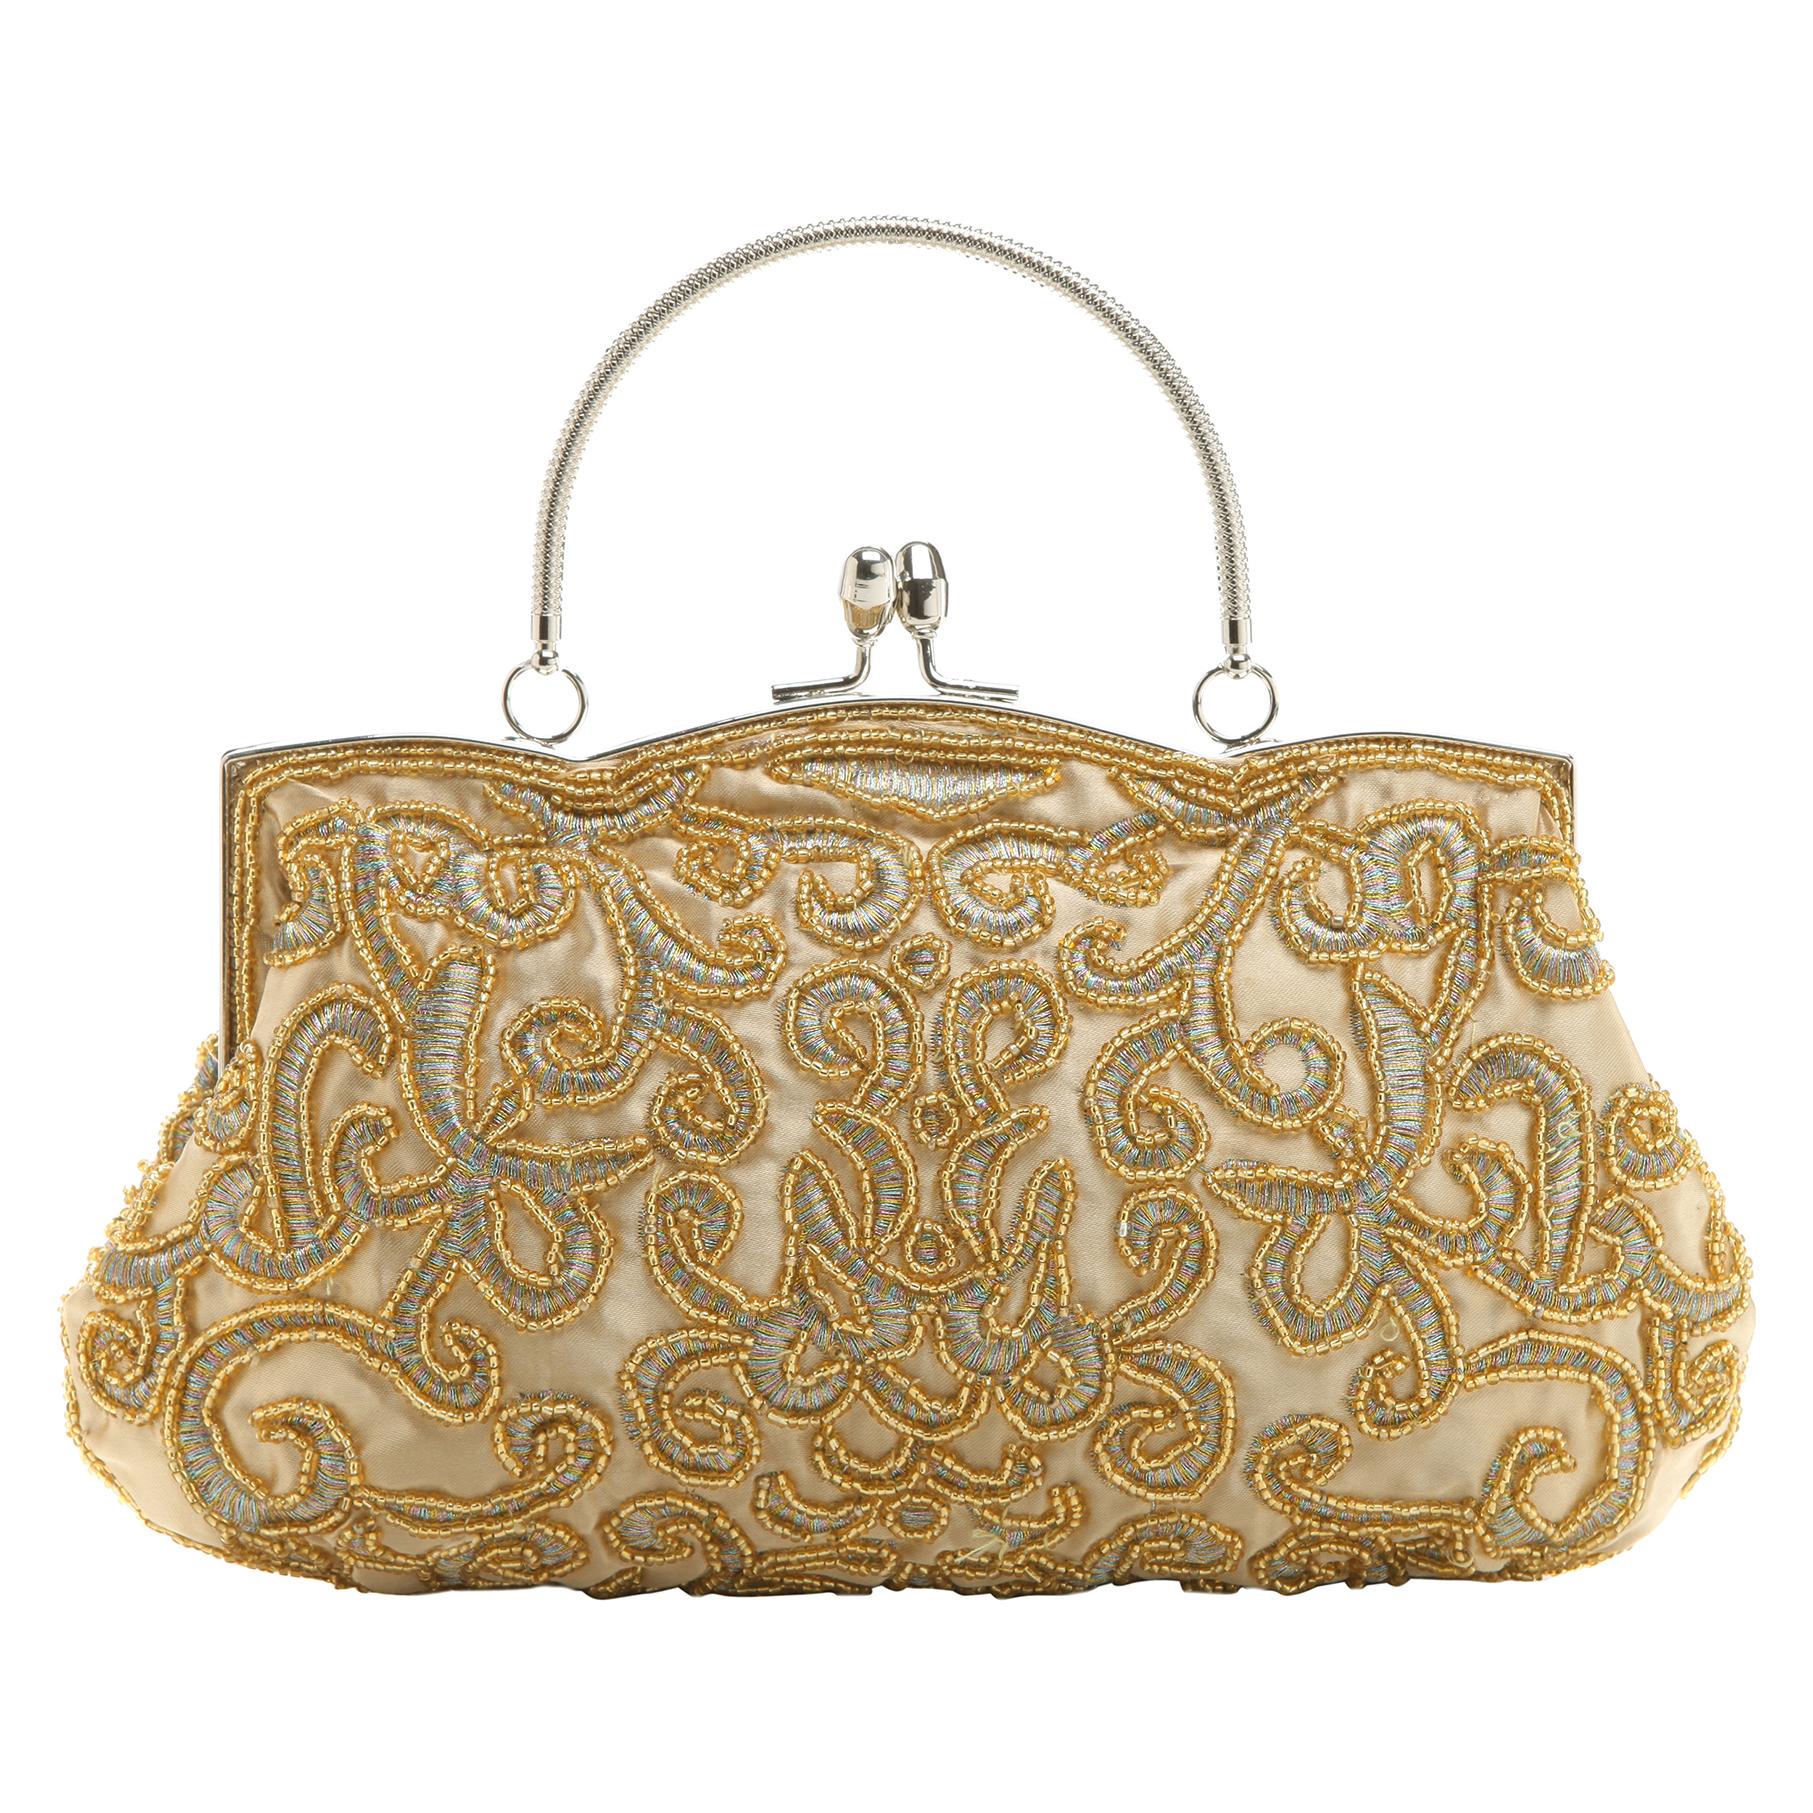 ADELE Gold Embroidered Evening Handbag front